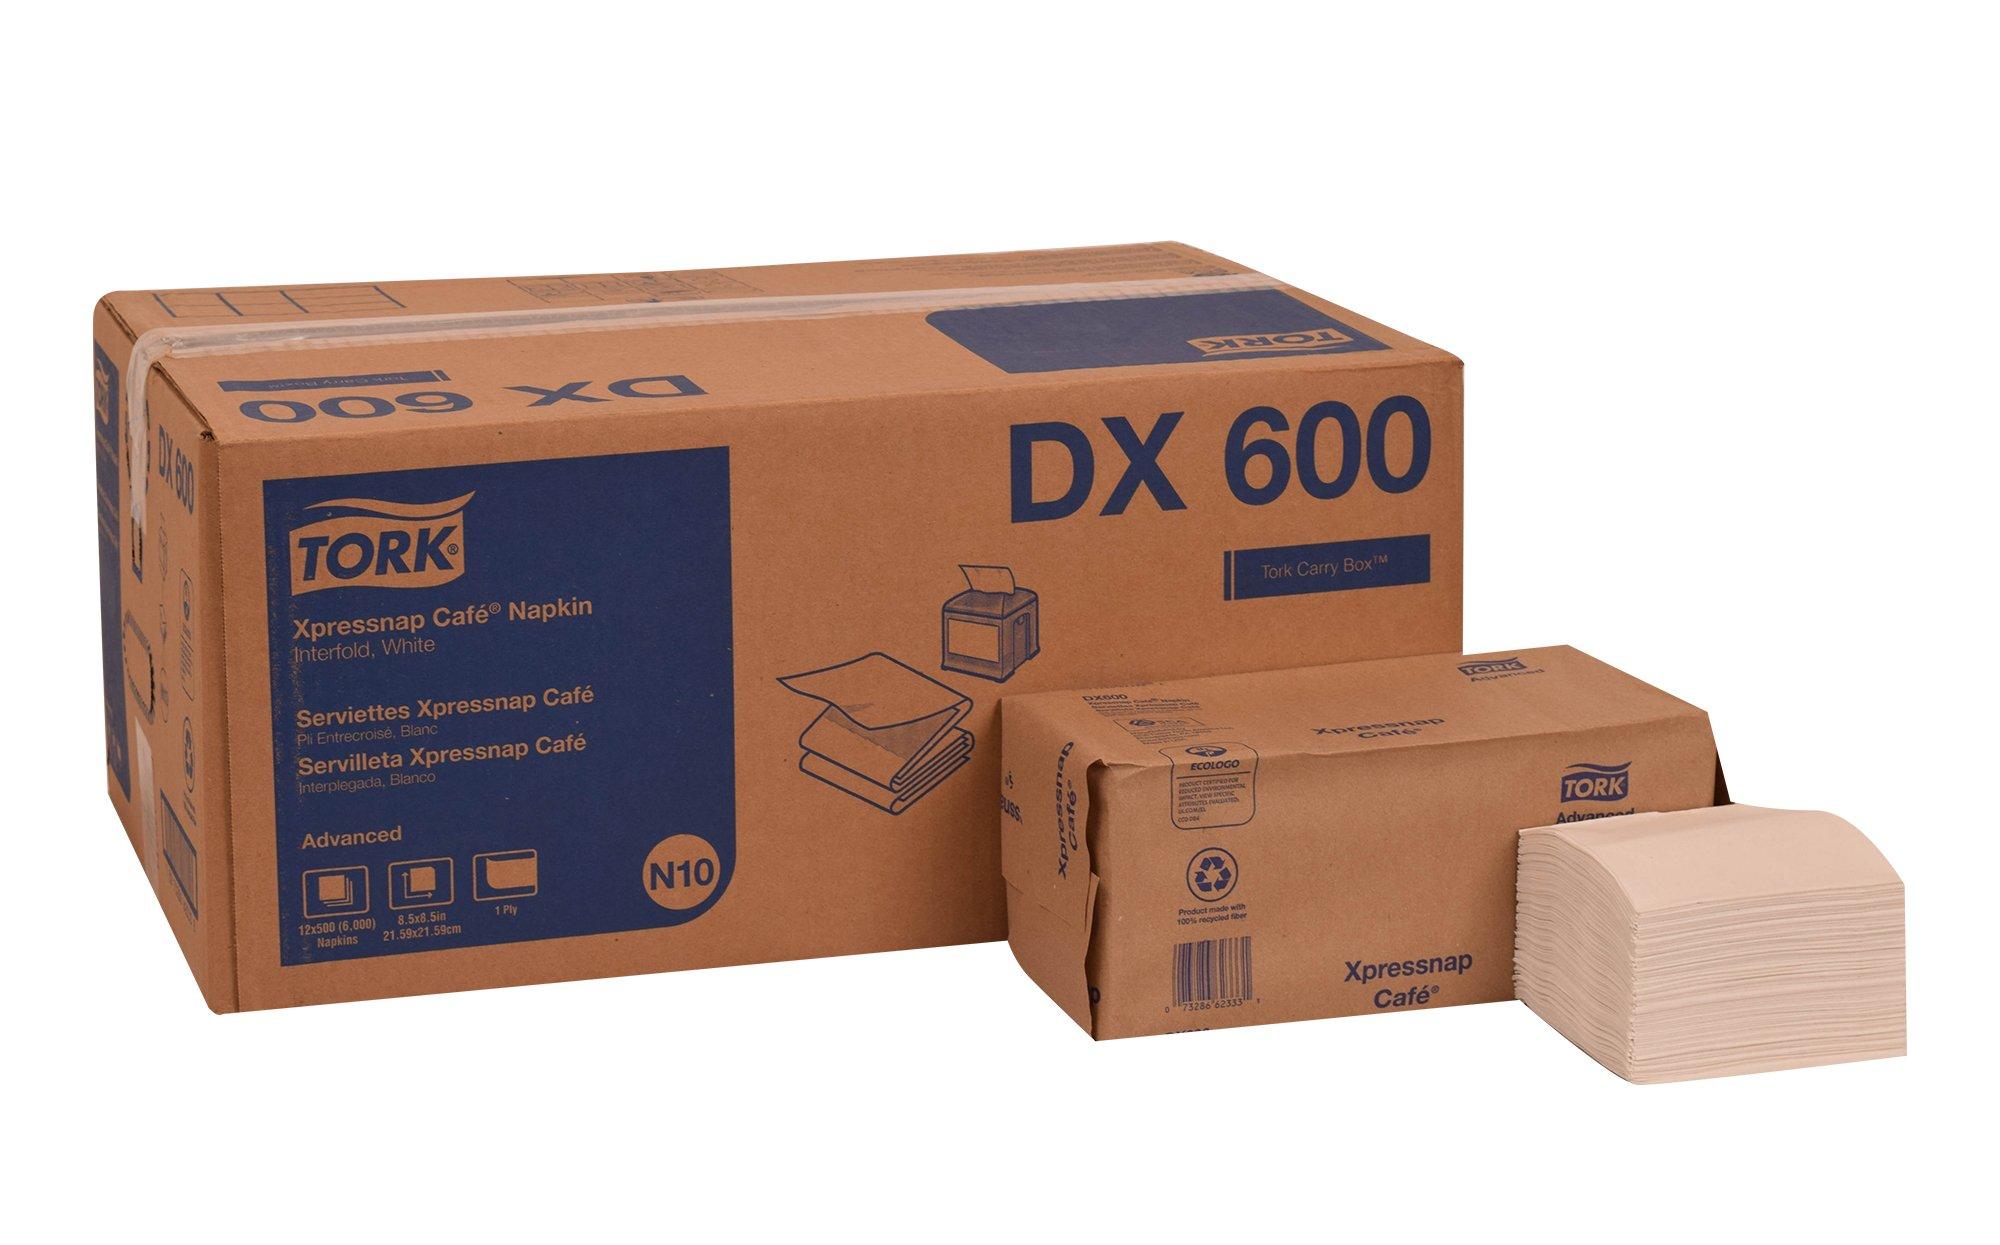 Tork DX600 Advanced Xpressnap Café Dispenser Napkin, Interfold, 1-Ply, 8.5'' Length x 8.5'' Width, White (Case of 12 Packs, 500 per Pack, 6,000 Napkins)